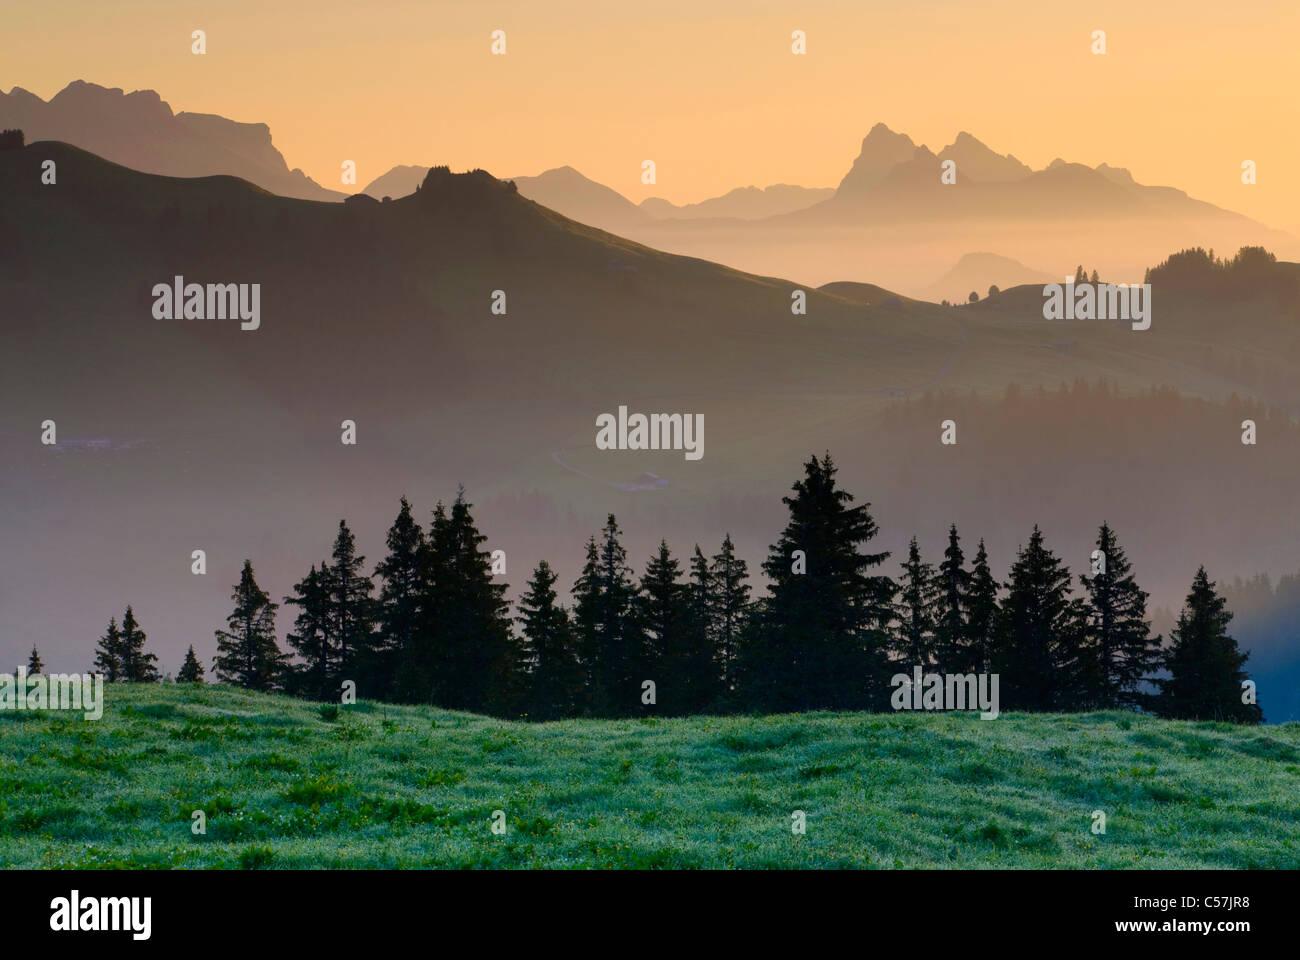 Pays d'Enhaut, Switzerland, Europe, canton Vaud, alp, wood, forest, firs, mountains, morning mood, sunrise - Stock Image